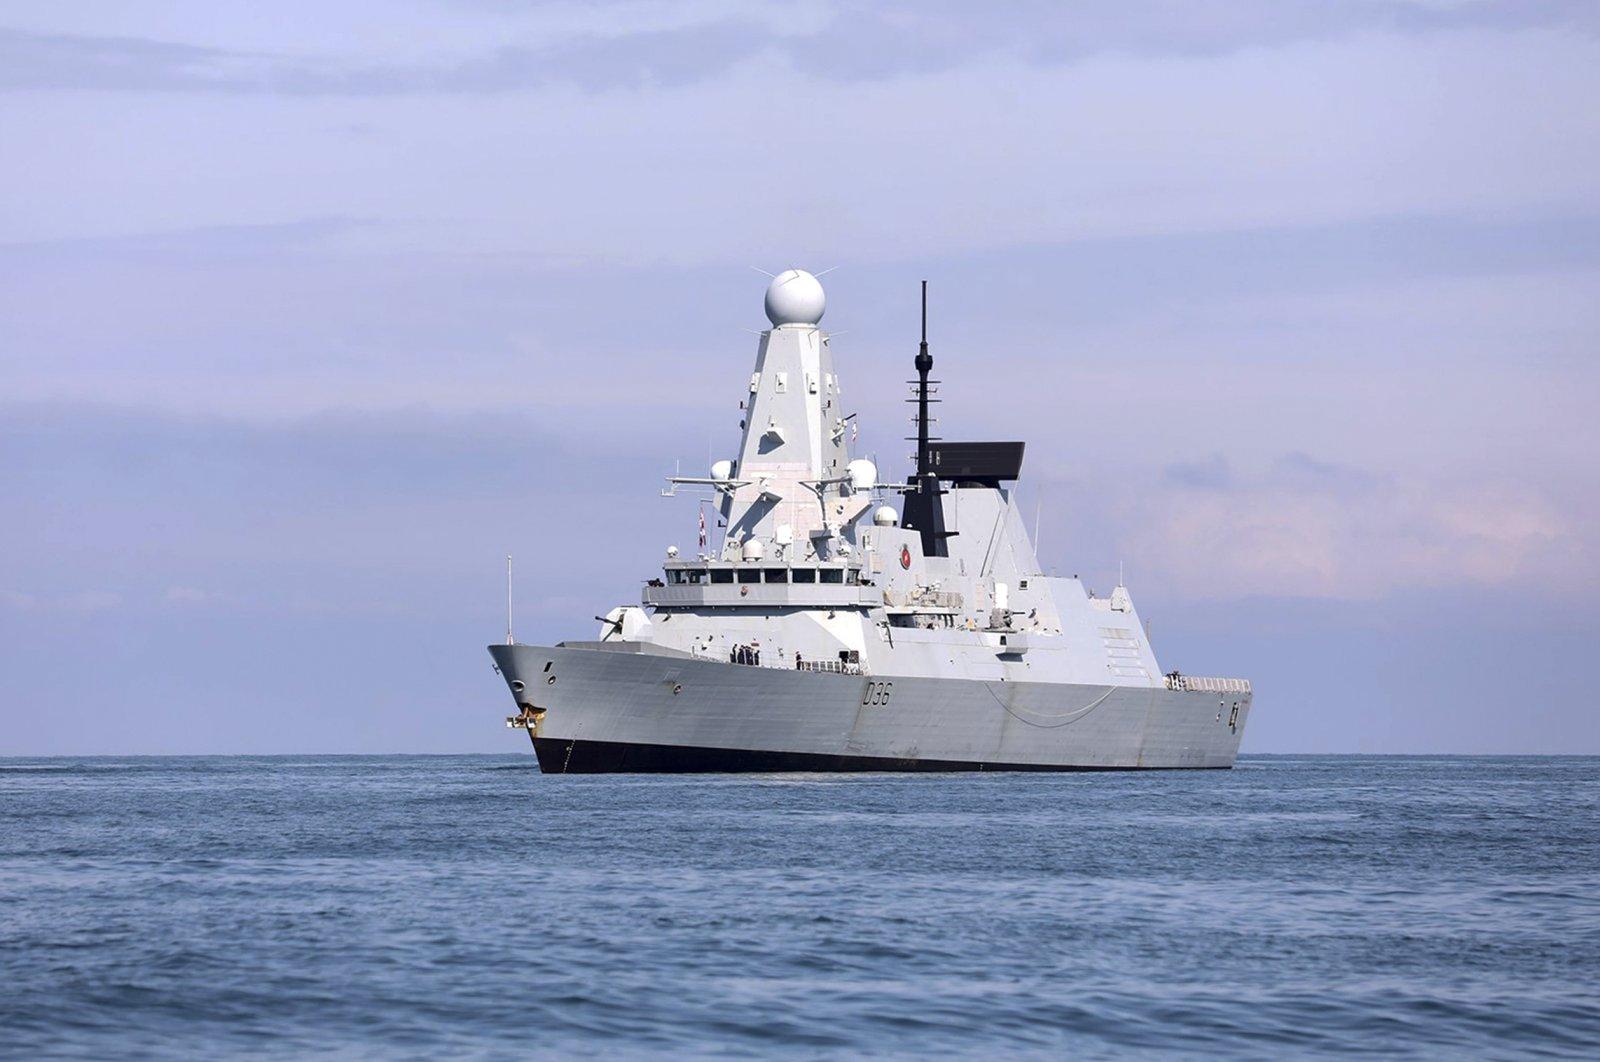 The British destroyer HMS Defender arrives at the port of Batumi, Georgia, June 26, 2021. (AP Photo)